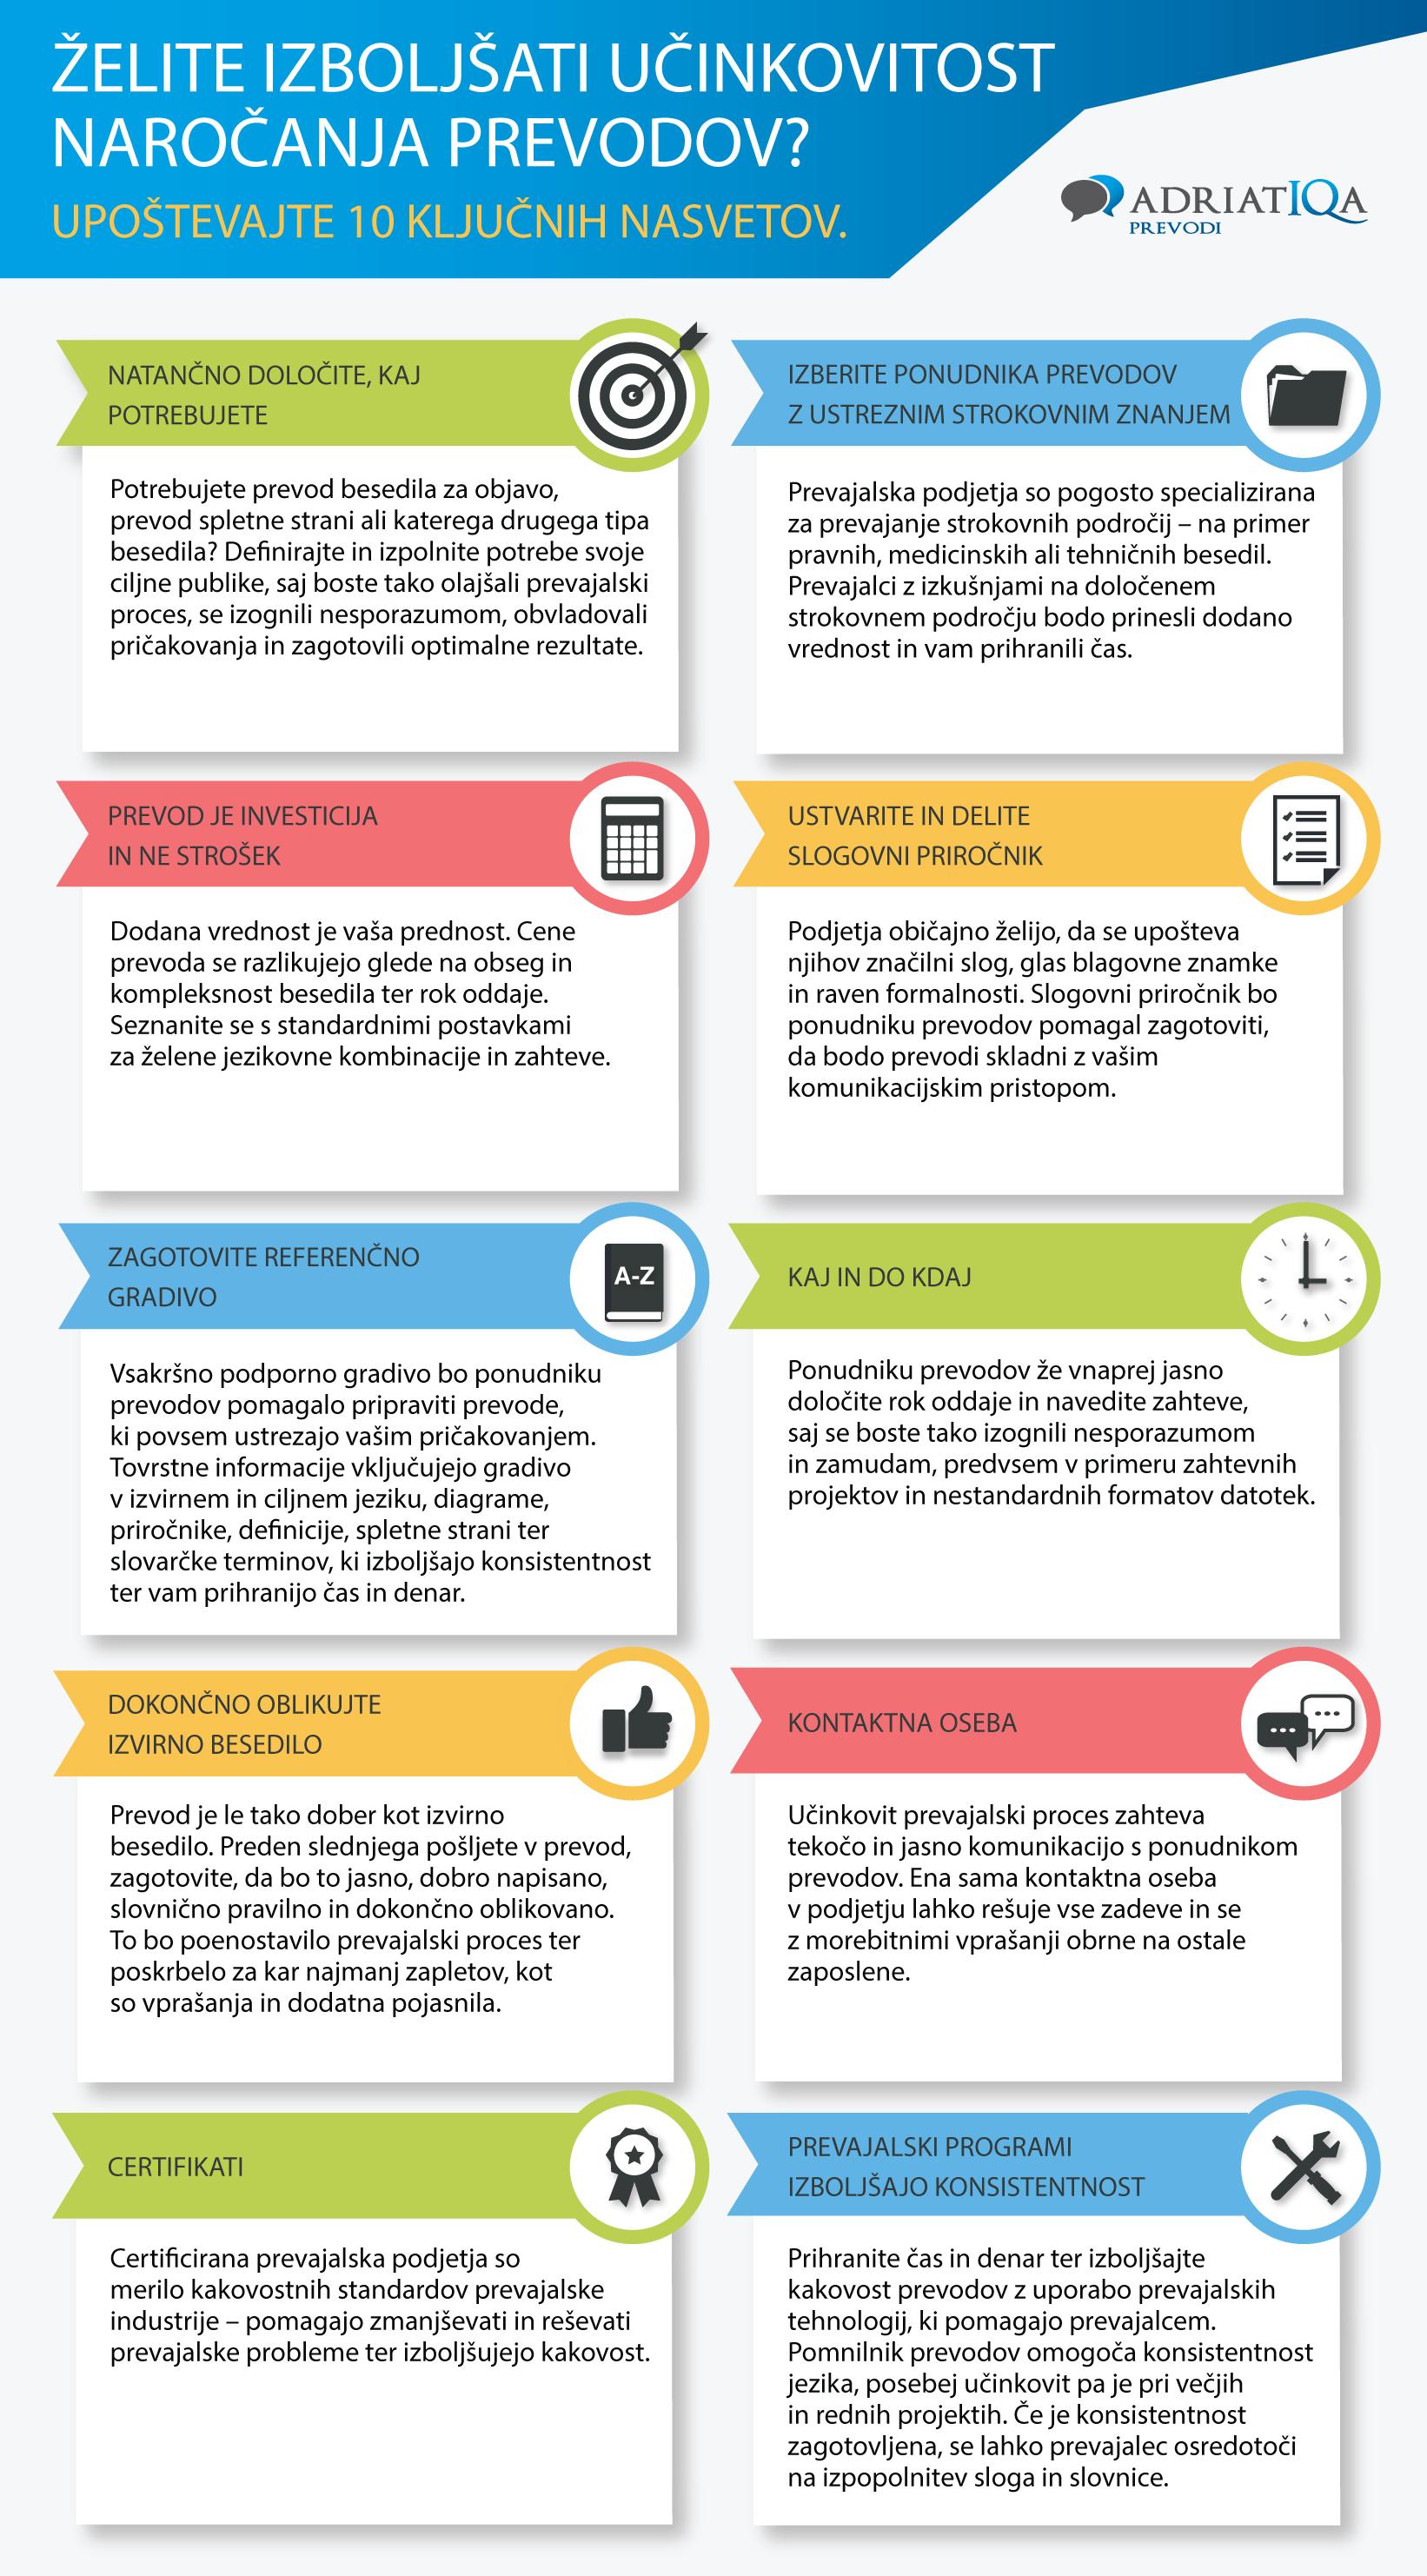 Infographic-translation-efficiency-SL-black